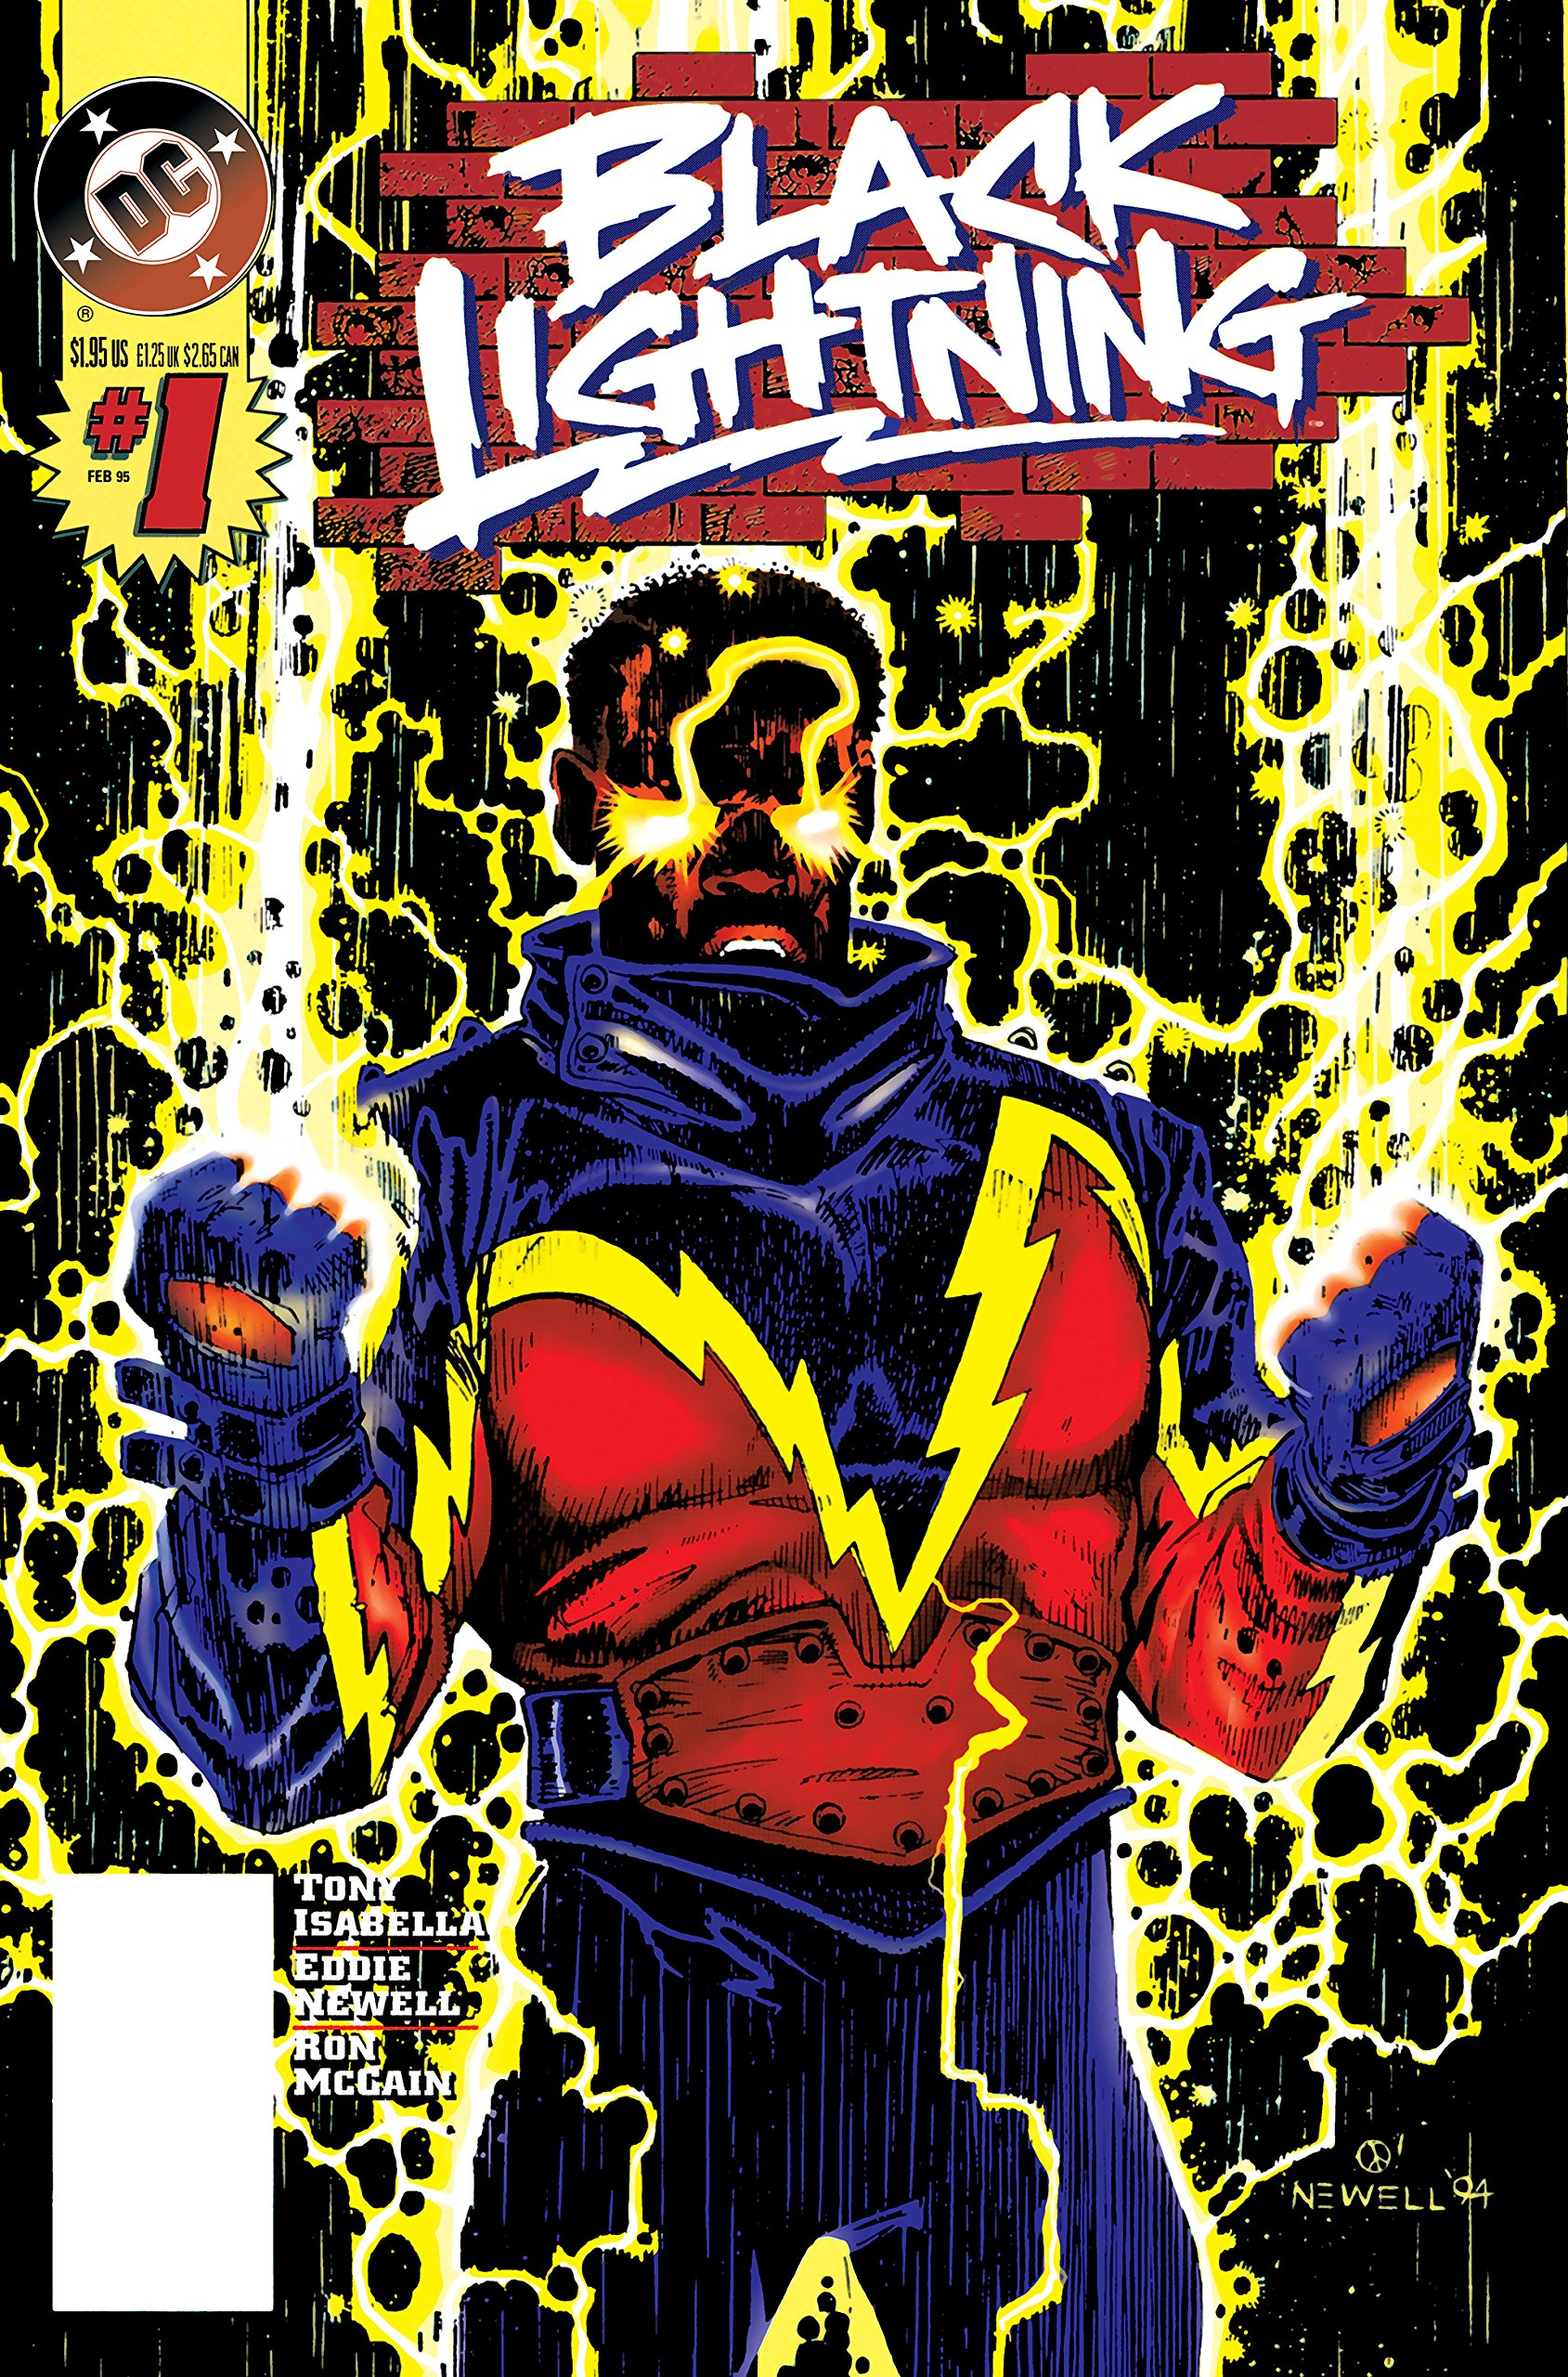 Black-Lightning-Vol.-2-1-13-1995-1996 ⋆ Atomic Junk Shop